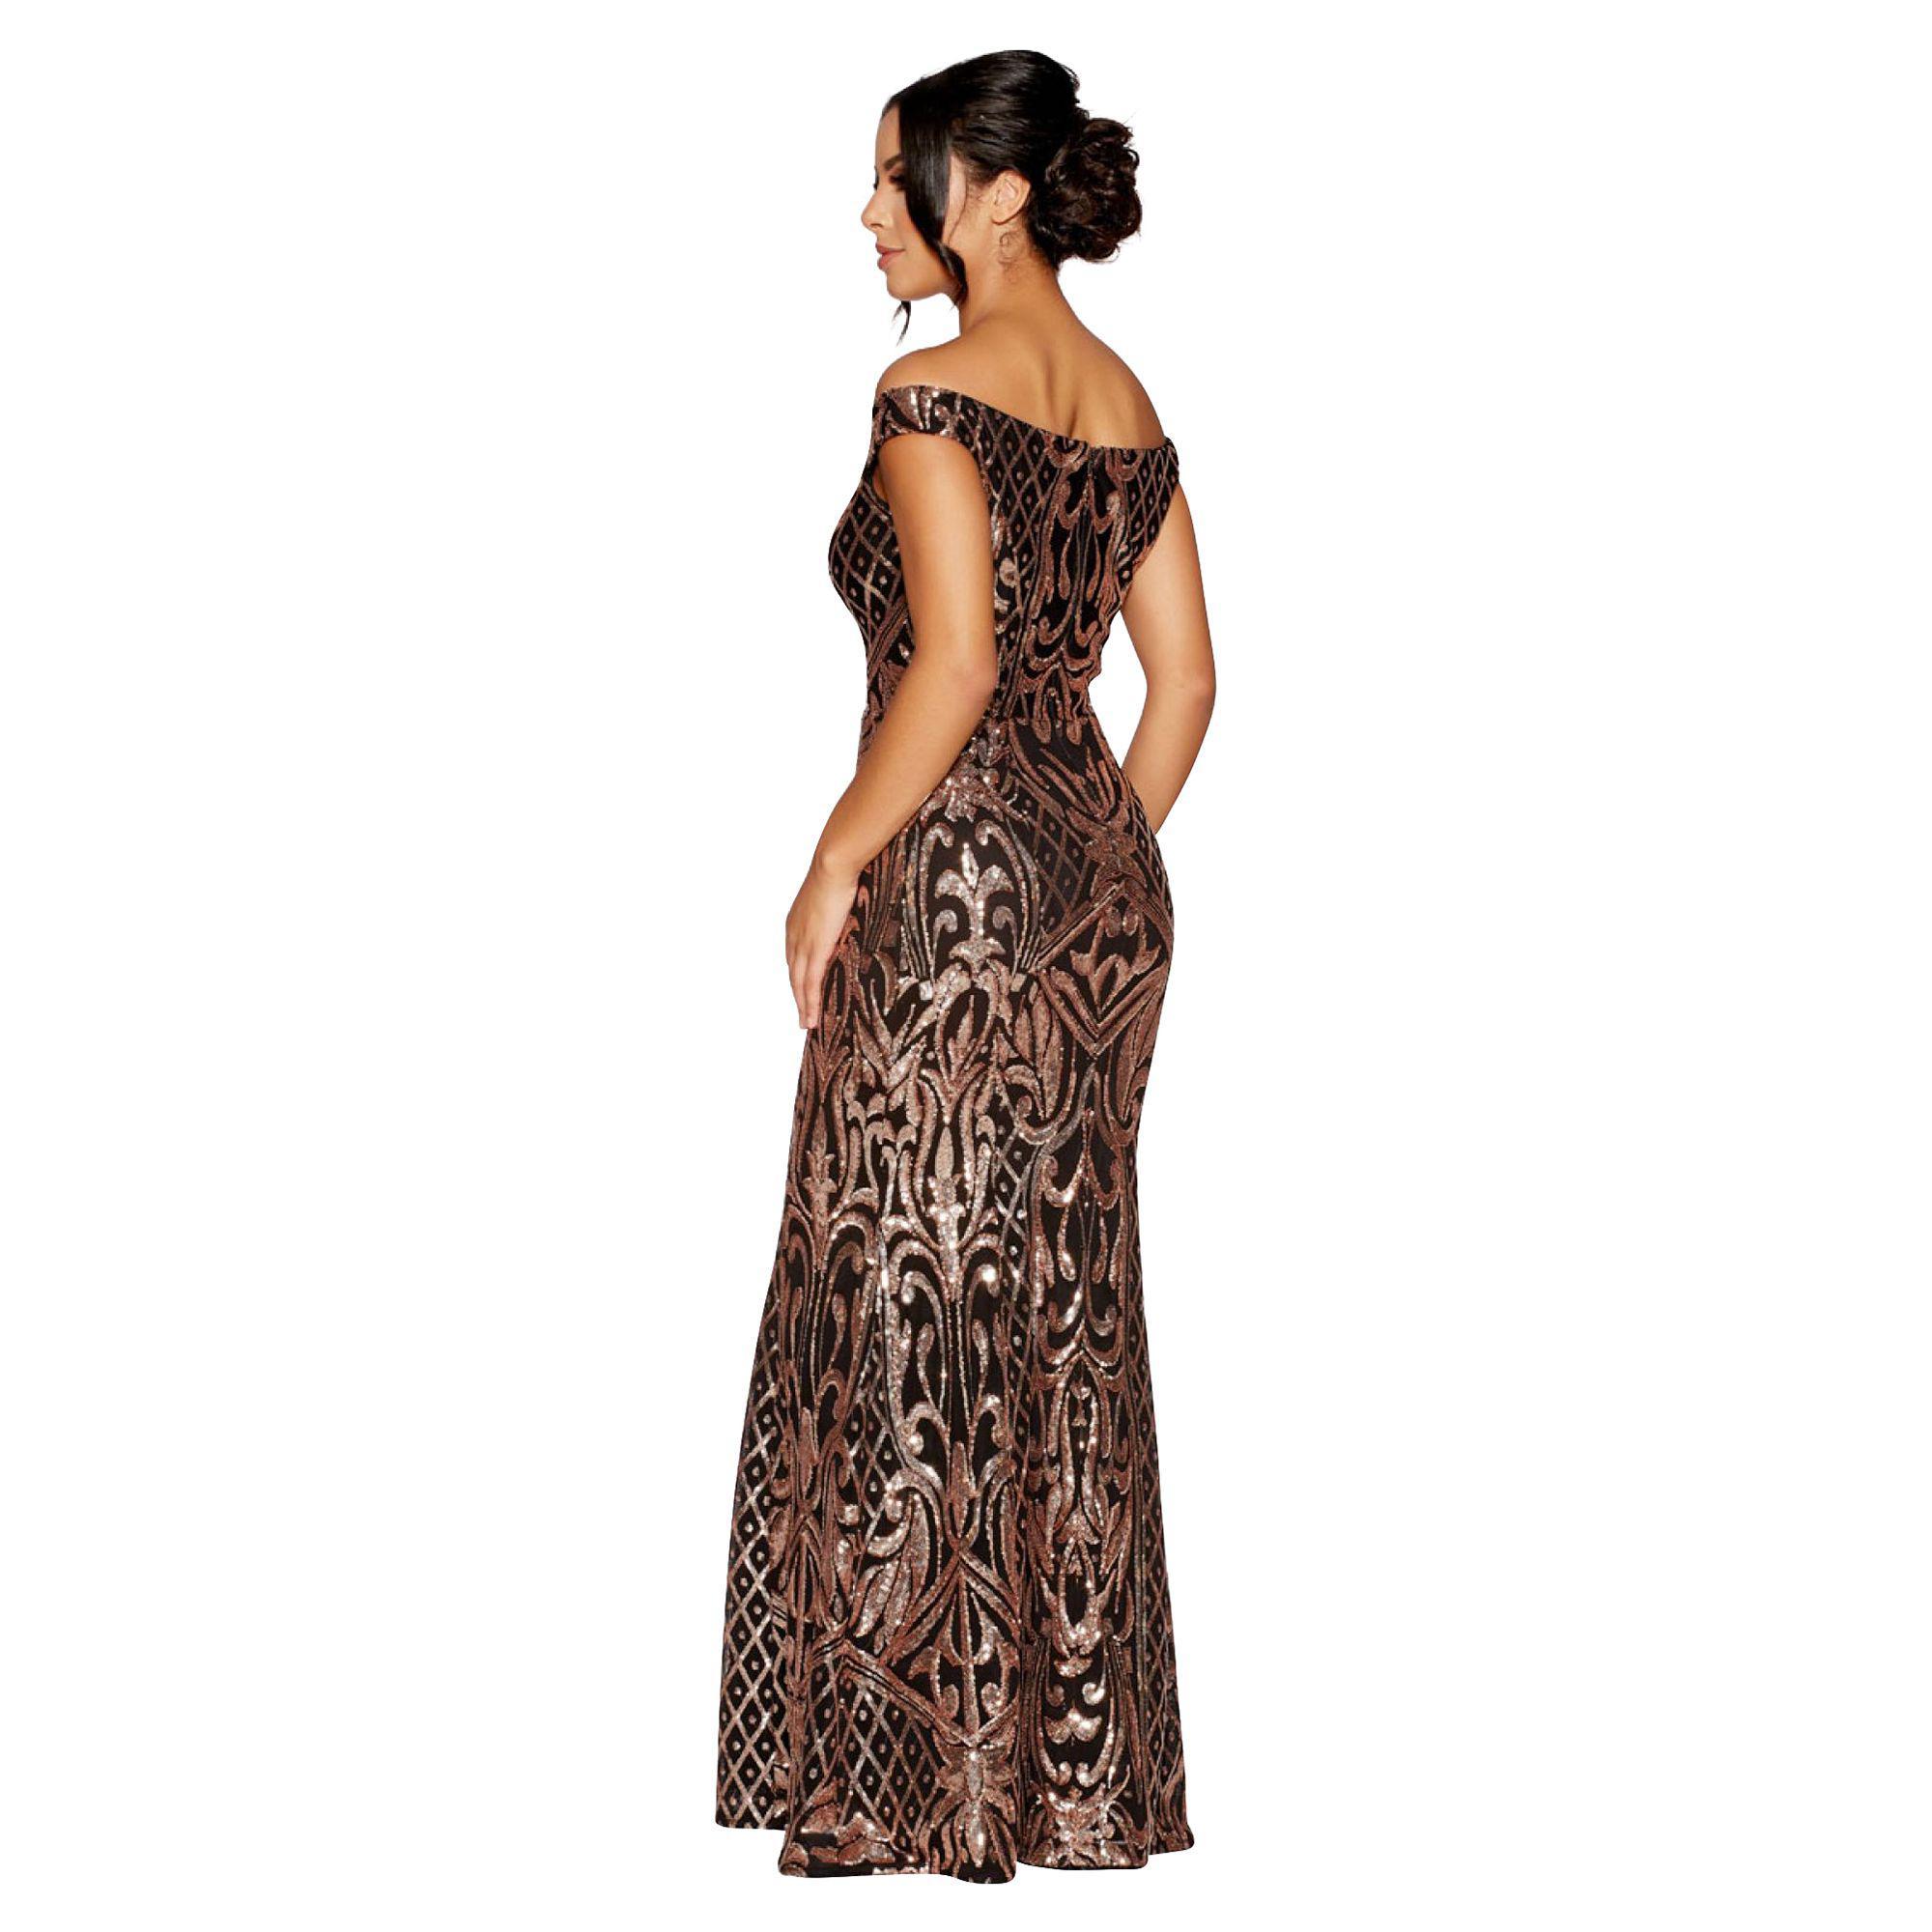 427e432b ... Quiz - Black And Rose Gold Sequin Bardot Maxi Dress - Lyst. Visit  Debenhams. Tap to visit site